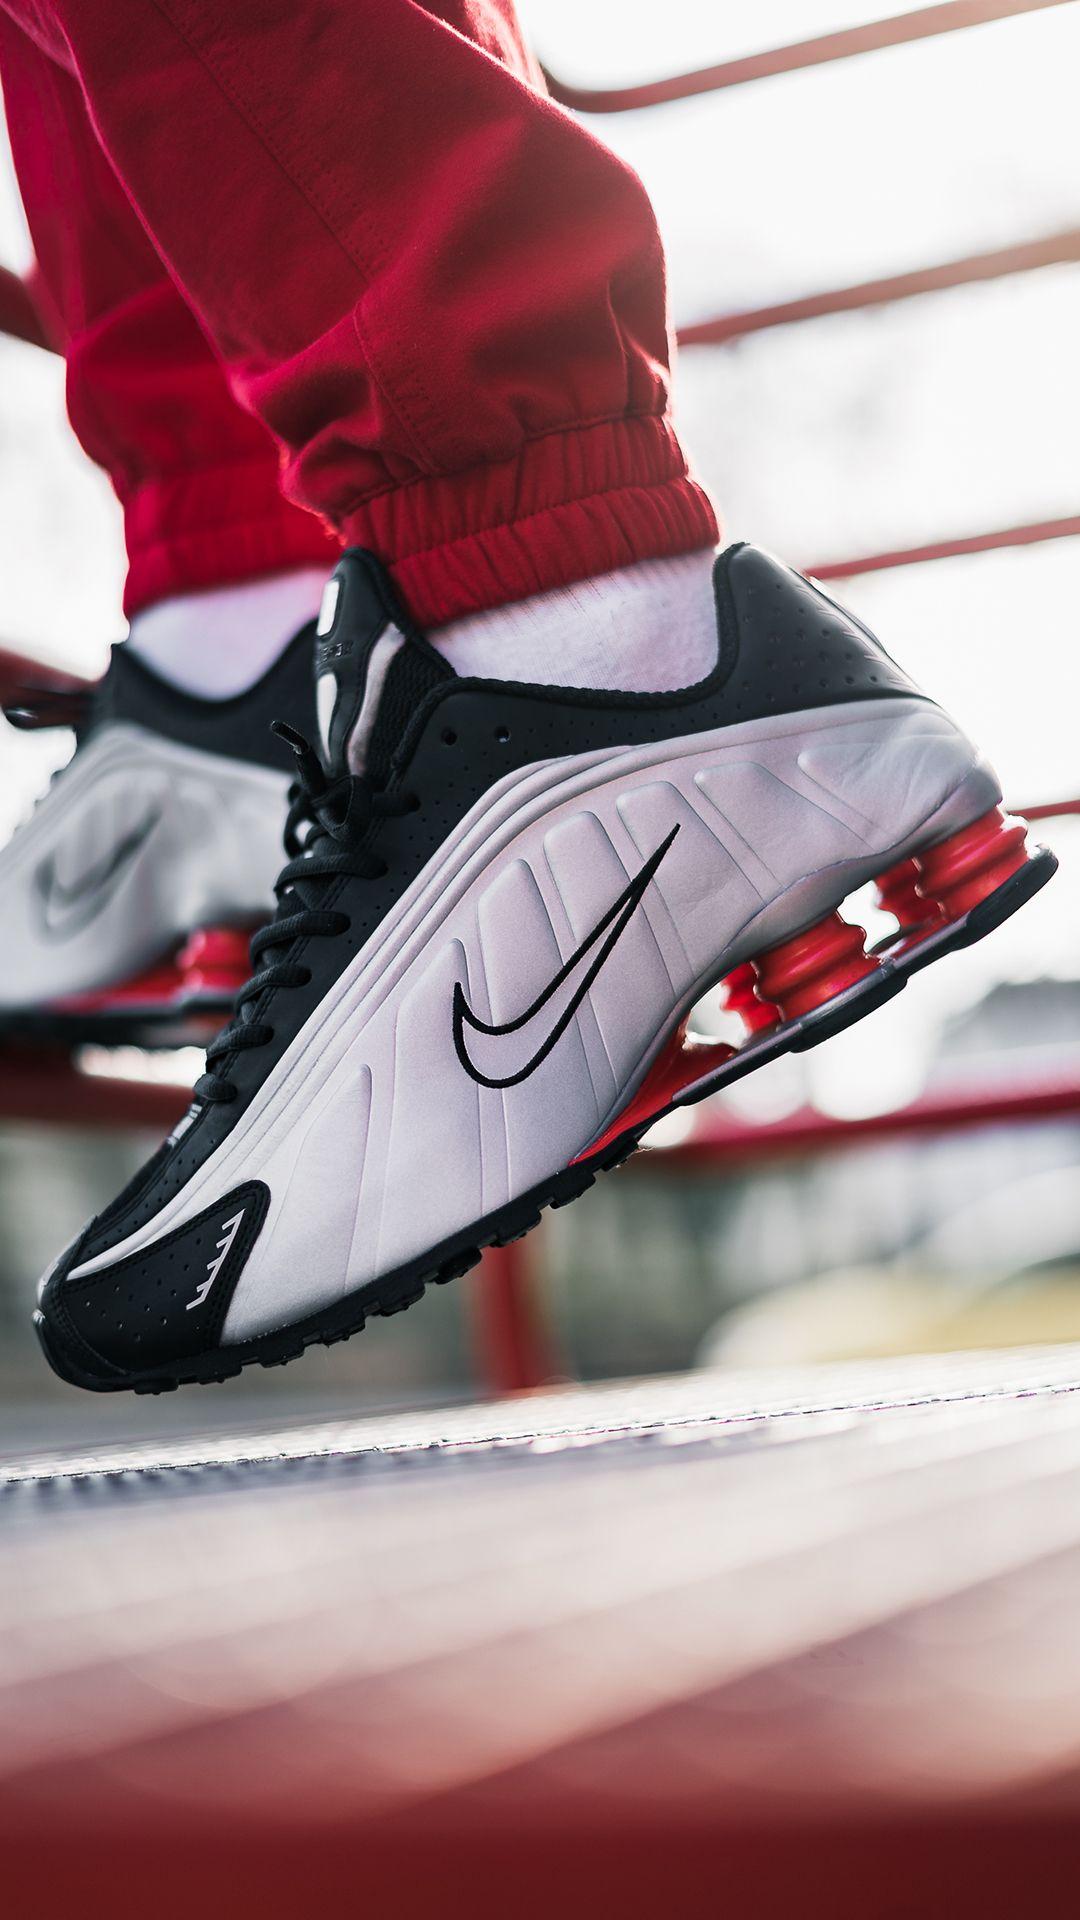 Nike Shox R4 (silver / black) Like4like